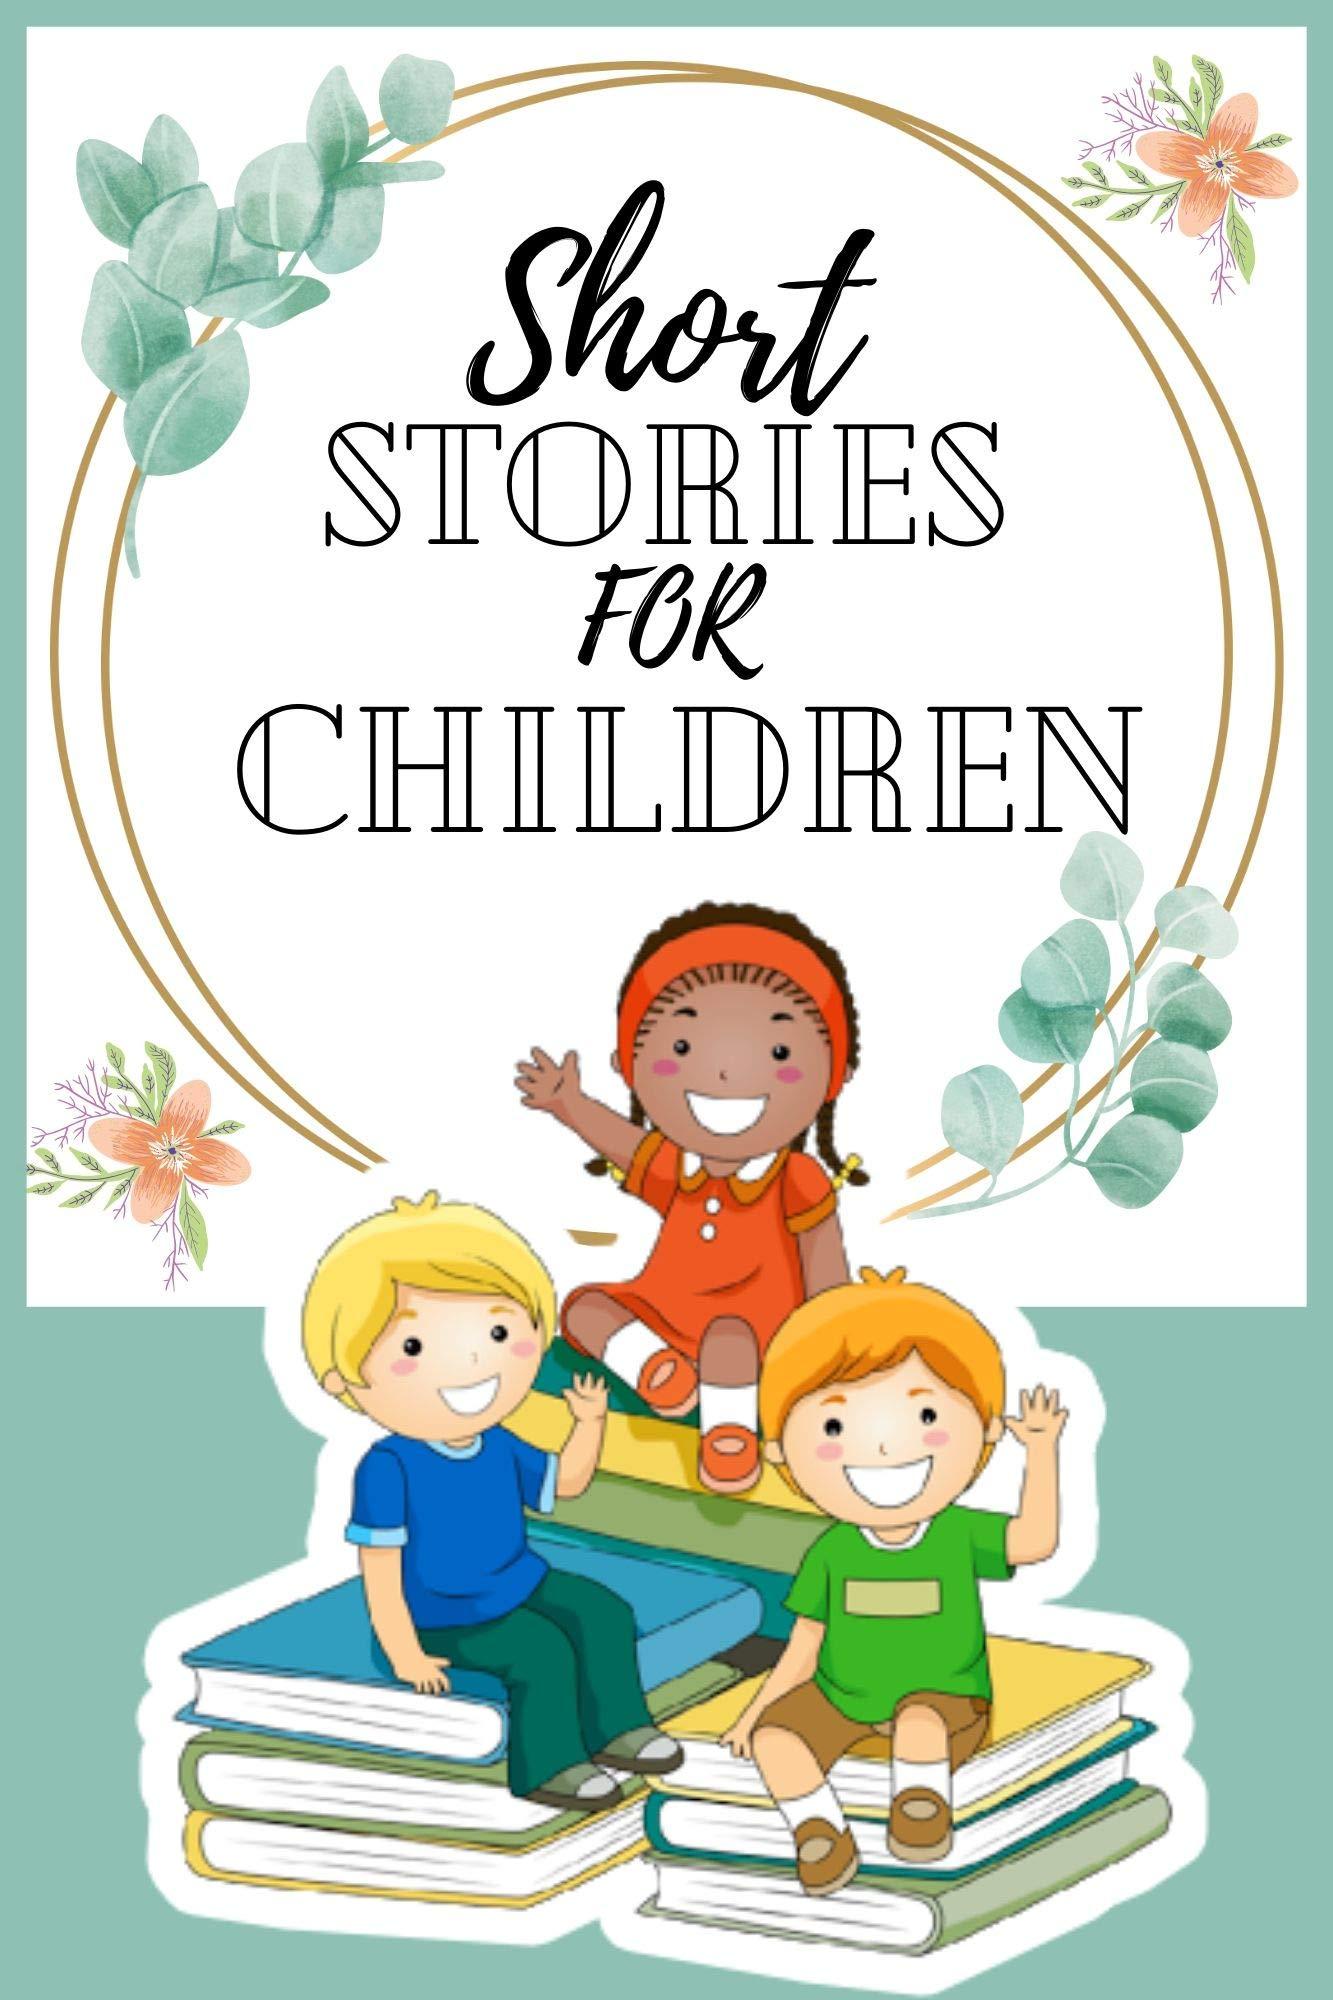 Short Stories for Children: Short Stories for Kids 4 - 12 years old